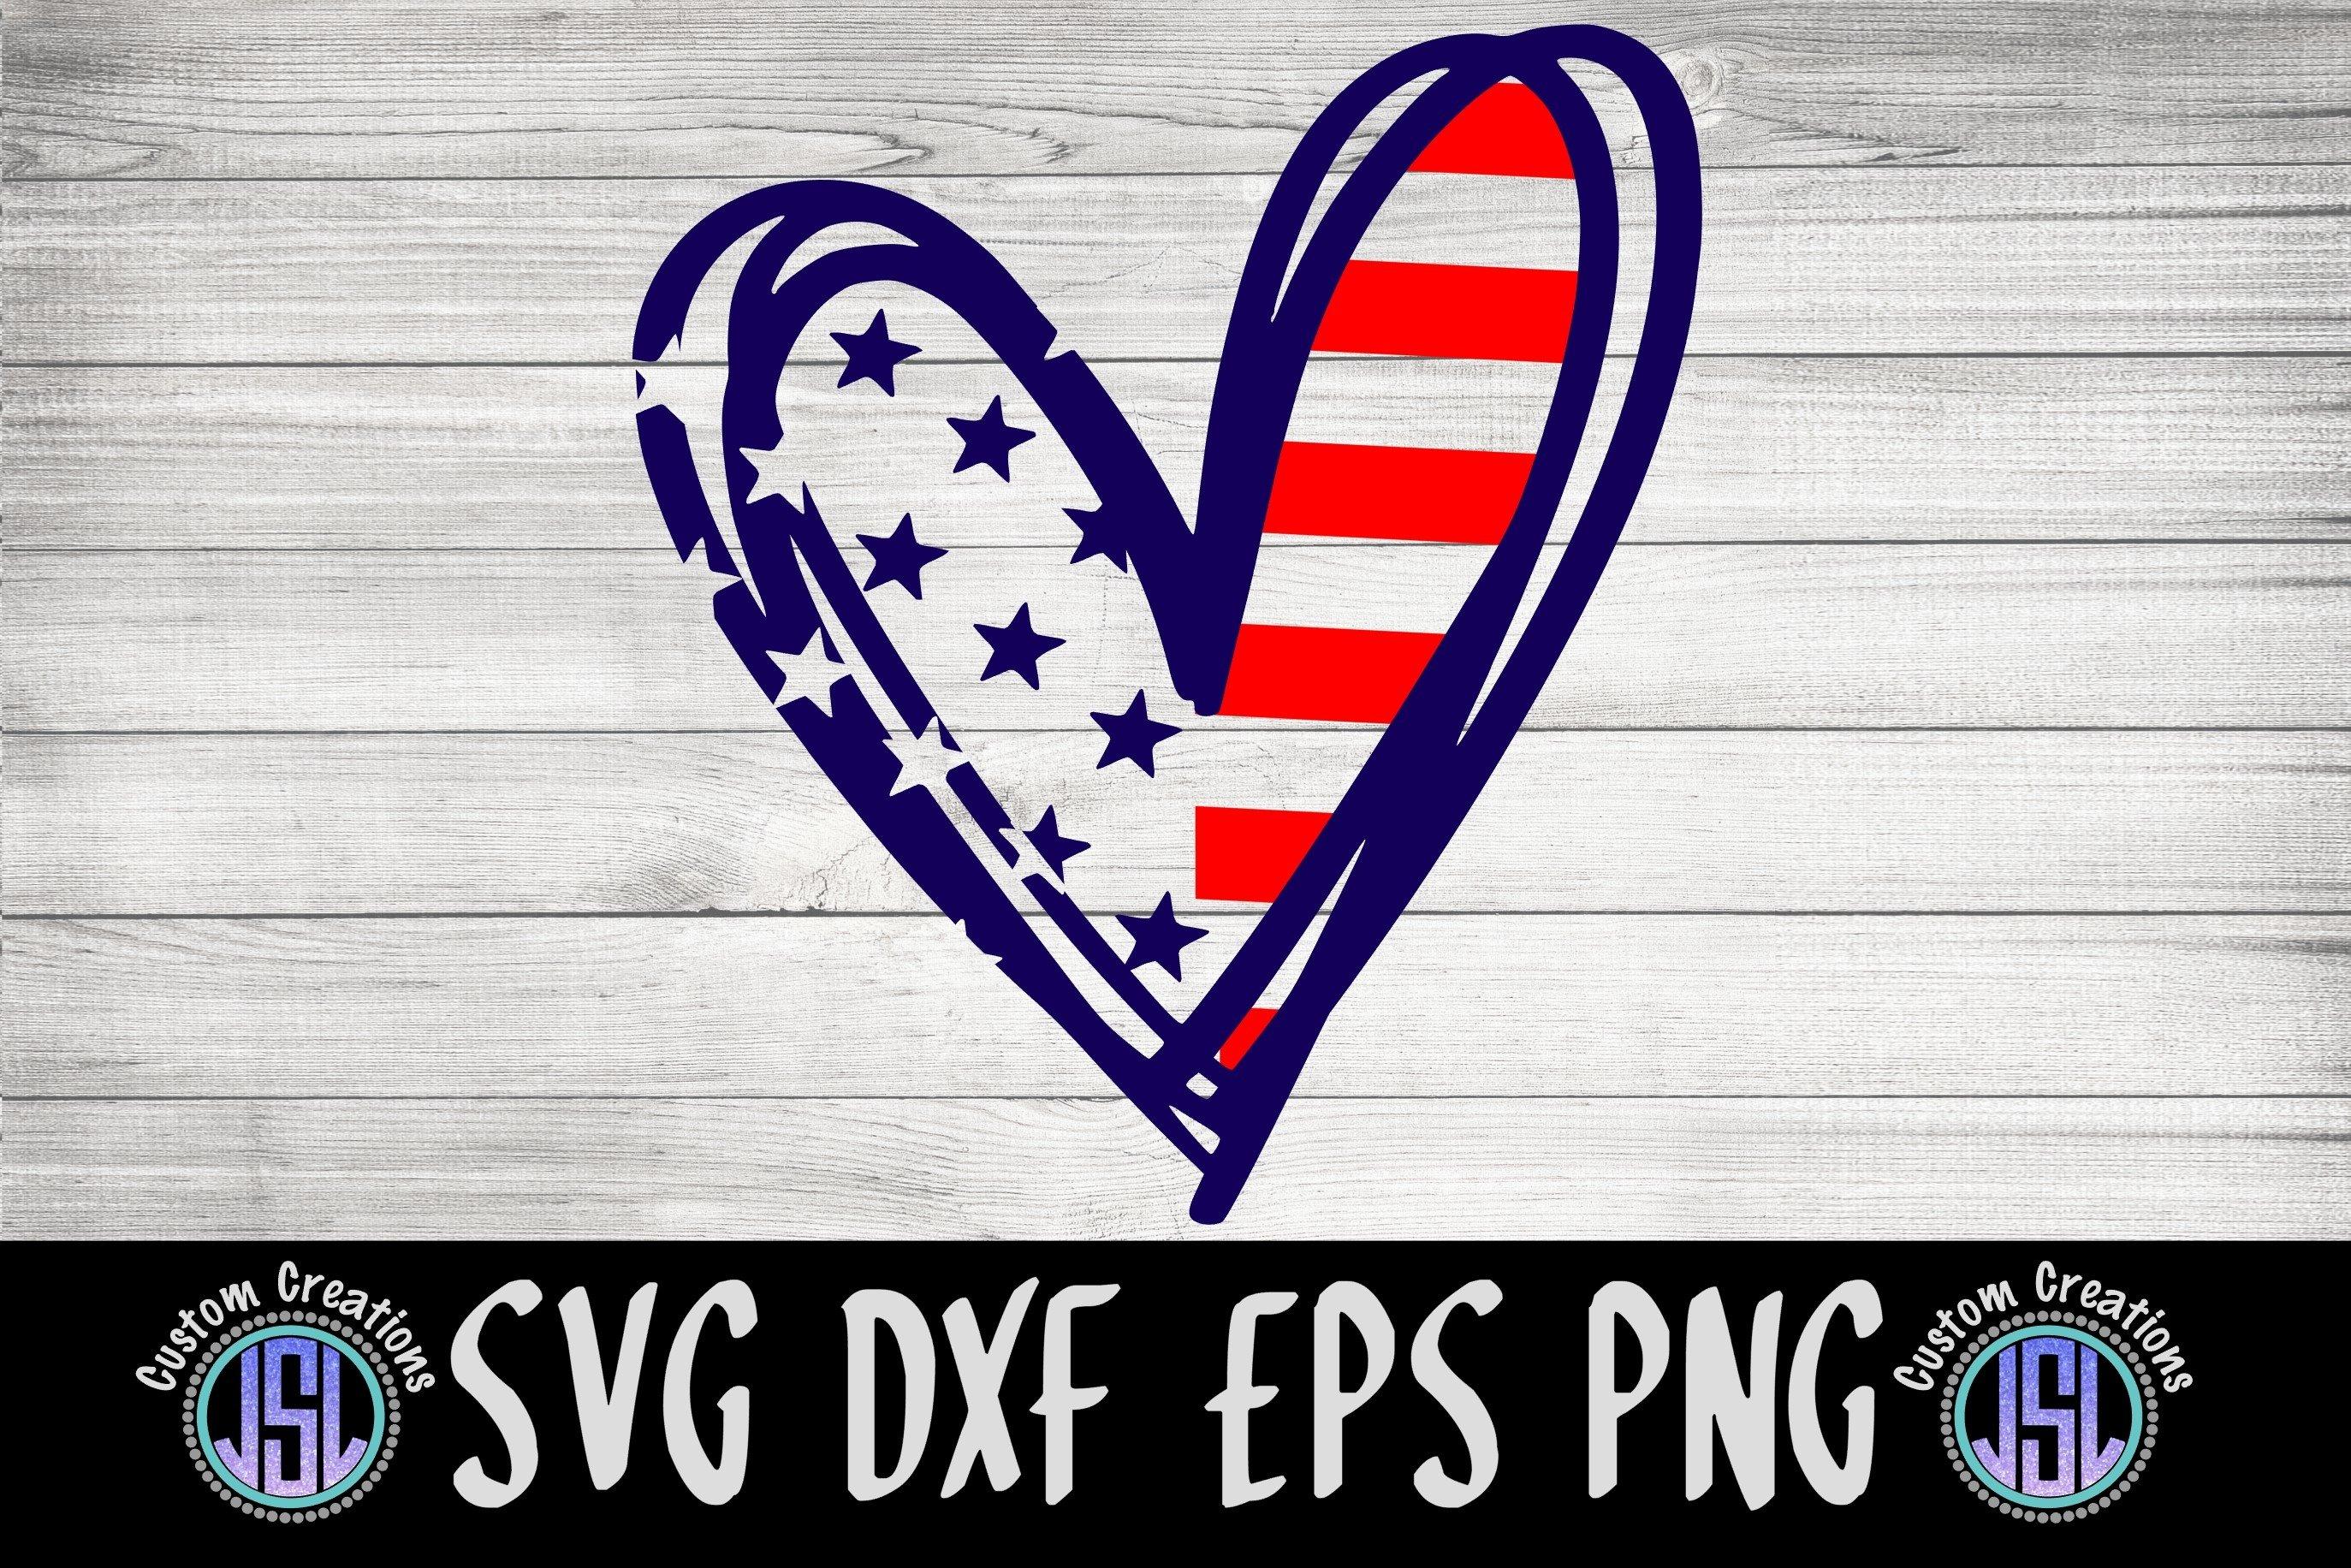 Patriotic Heart | Patriotic SVG Cut File | SVG DXF EPS PNG example image 2